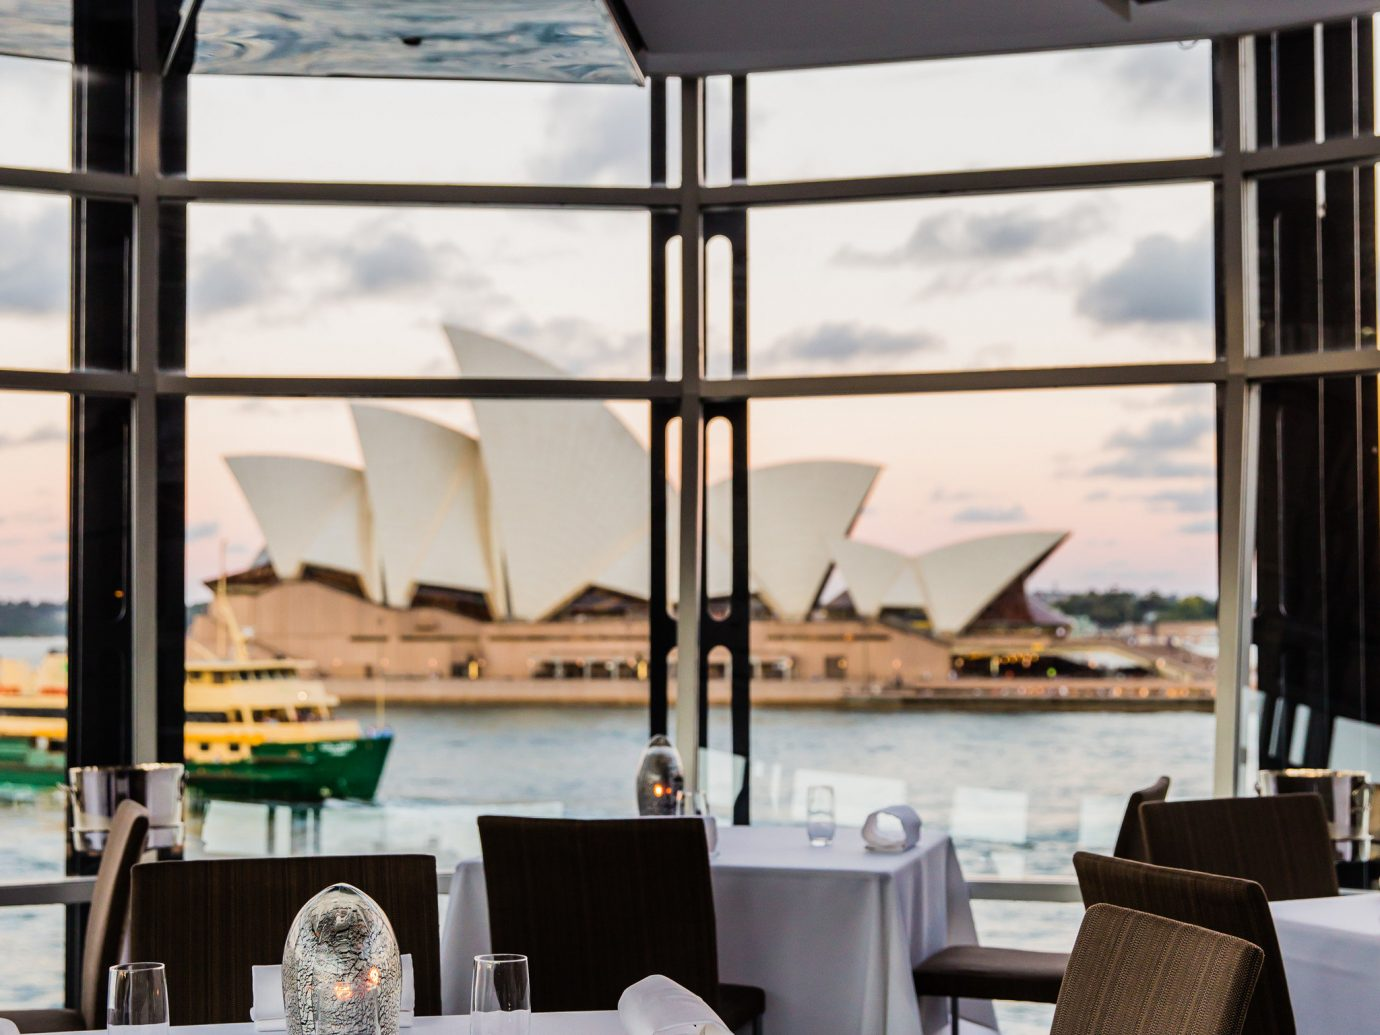 Trip Ideas indoor window restaurant room interior design home Design meal window covering